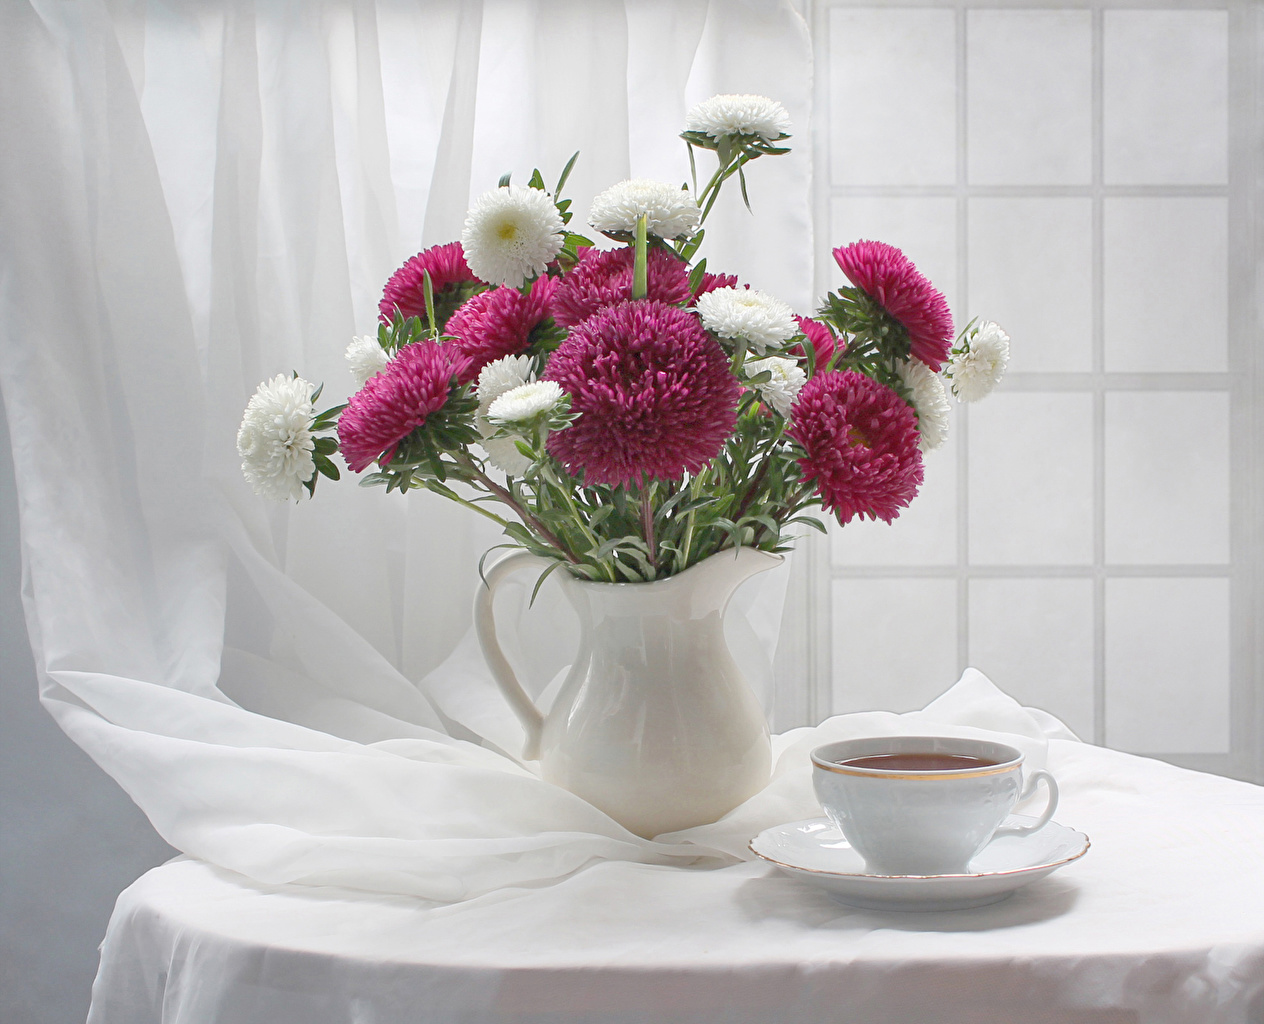 Фото Цветы Астры вазе стола Чашка Натюрморт Стол Ваза вазы столы чашке